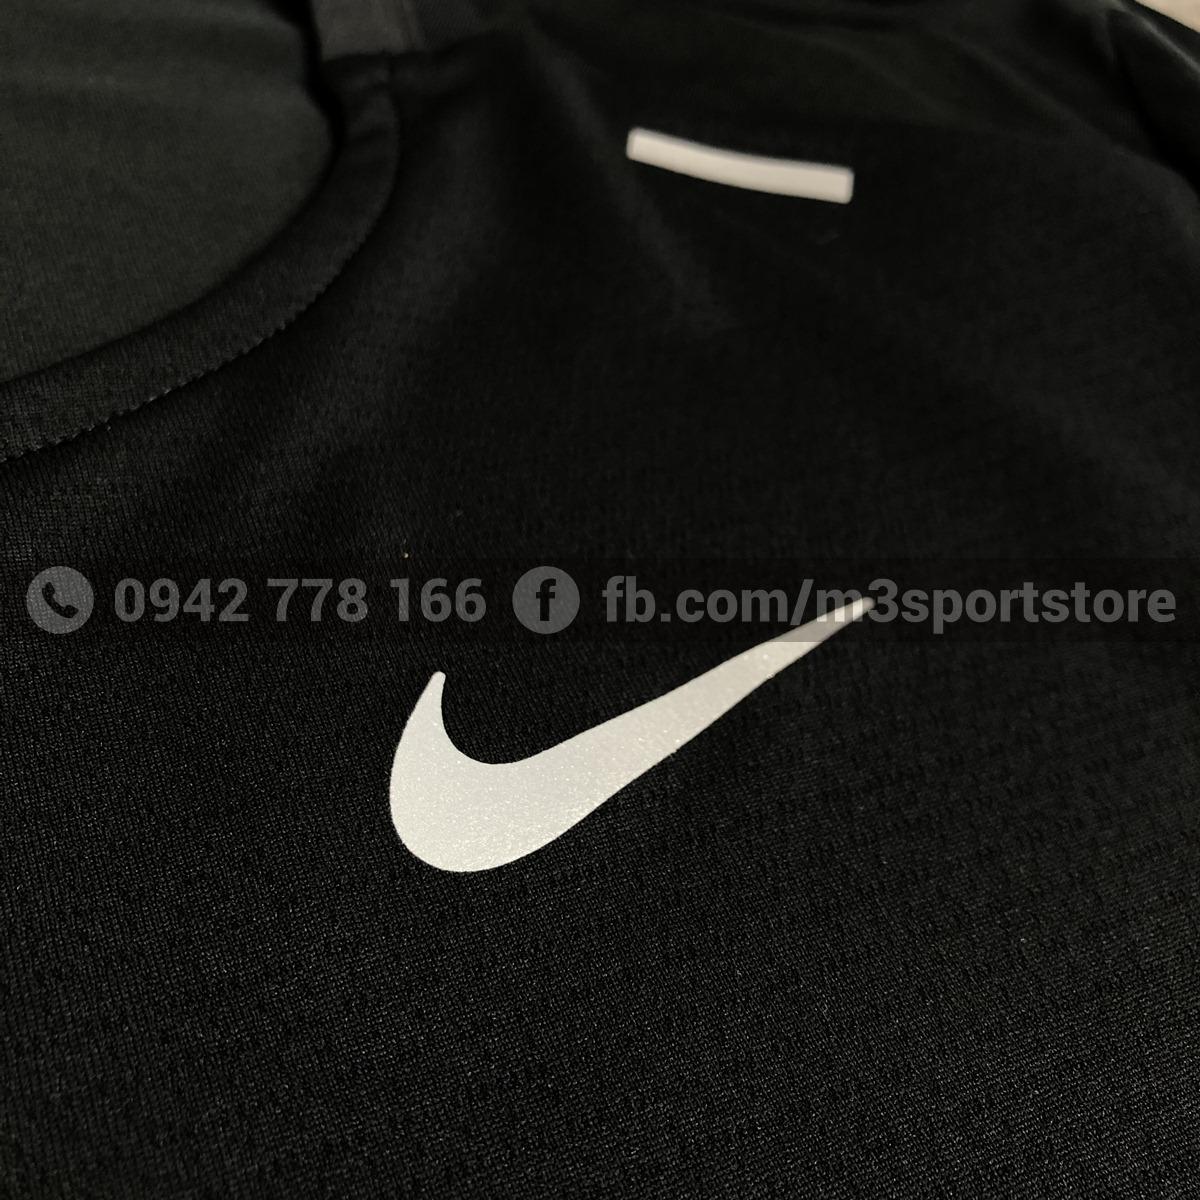 Áo thể thao nam Nike Dry Fit Rise 365 CZ9185